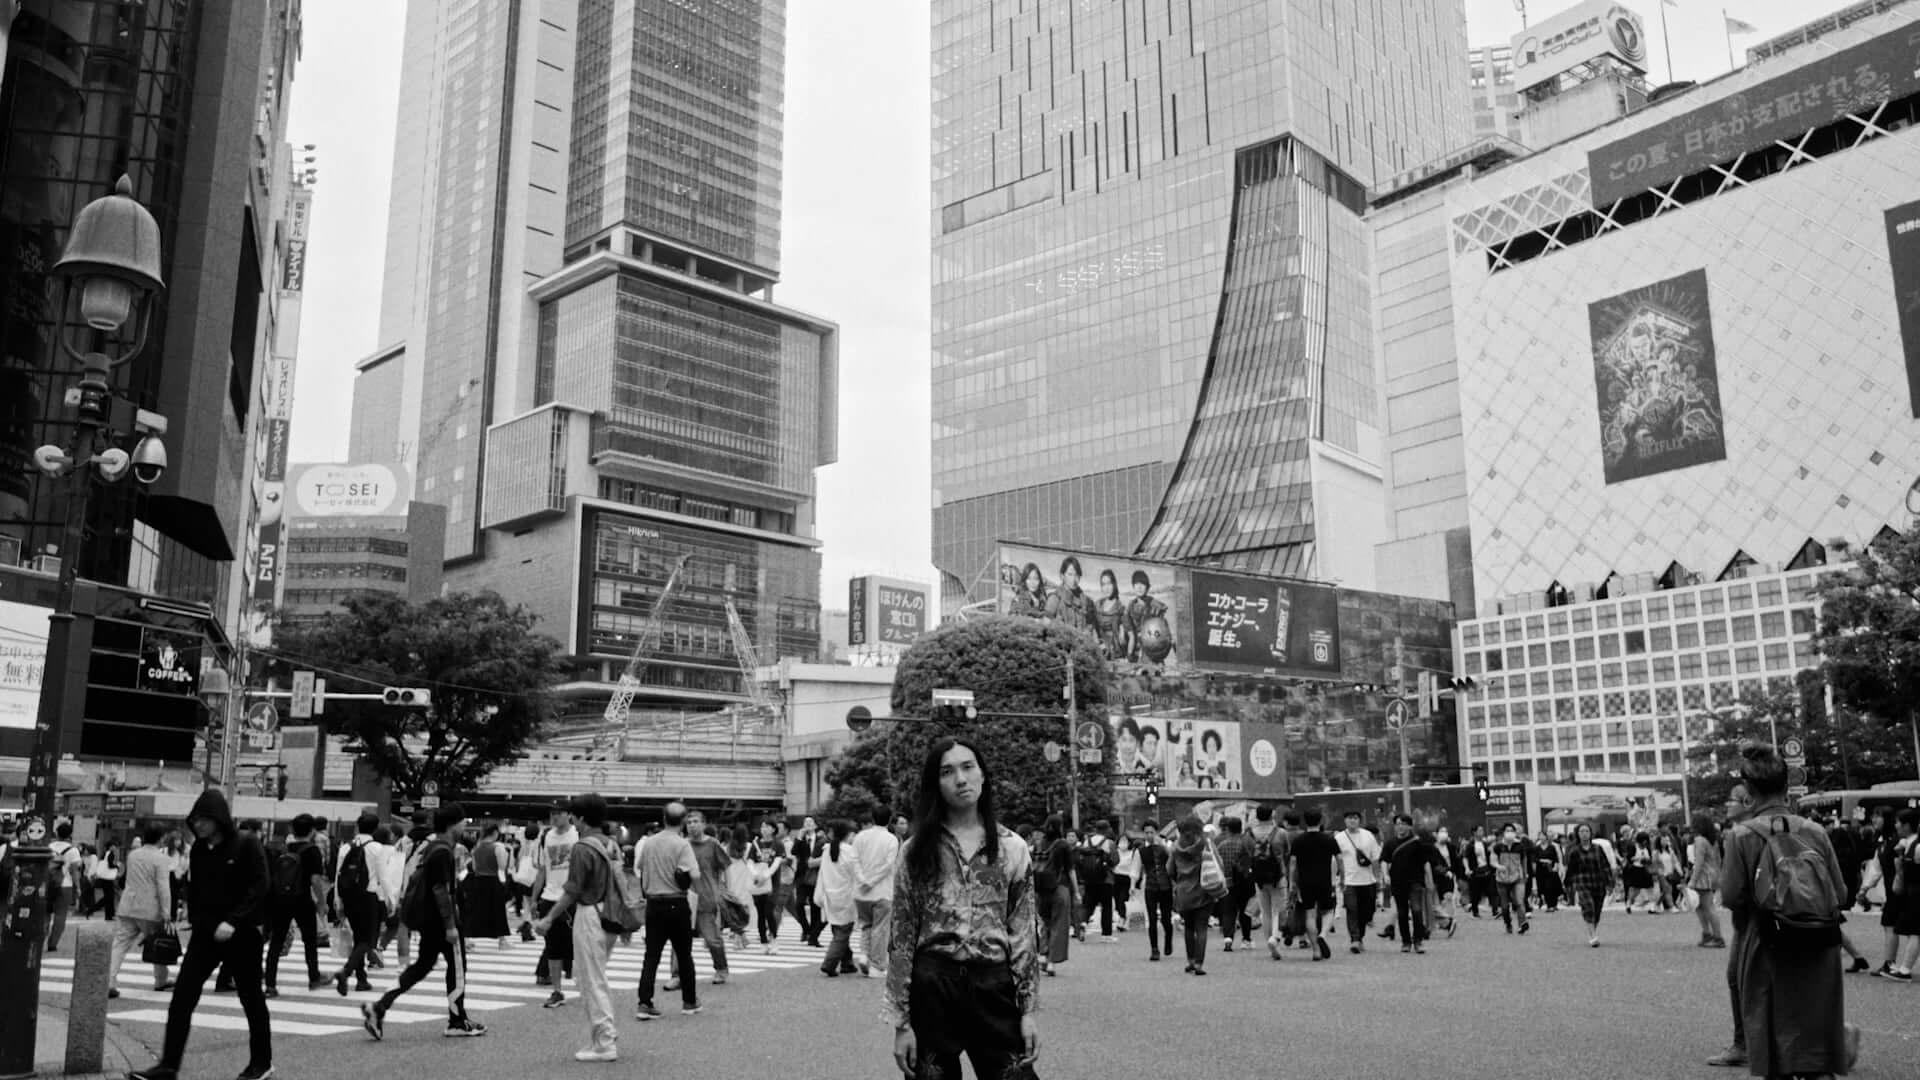 Seiho、映像作家・山田智和6年ぶりのオリジナル作品に参加|10台のマルチモニターを使ったアート展示 artculture190801seiho_3-1920x1080